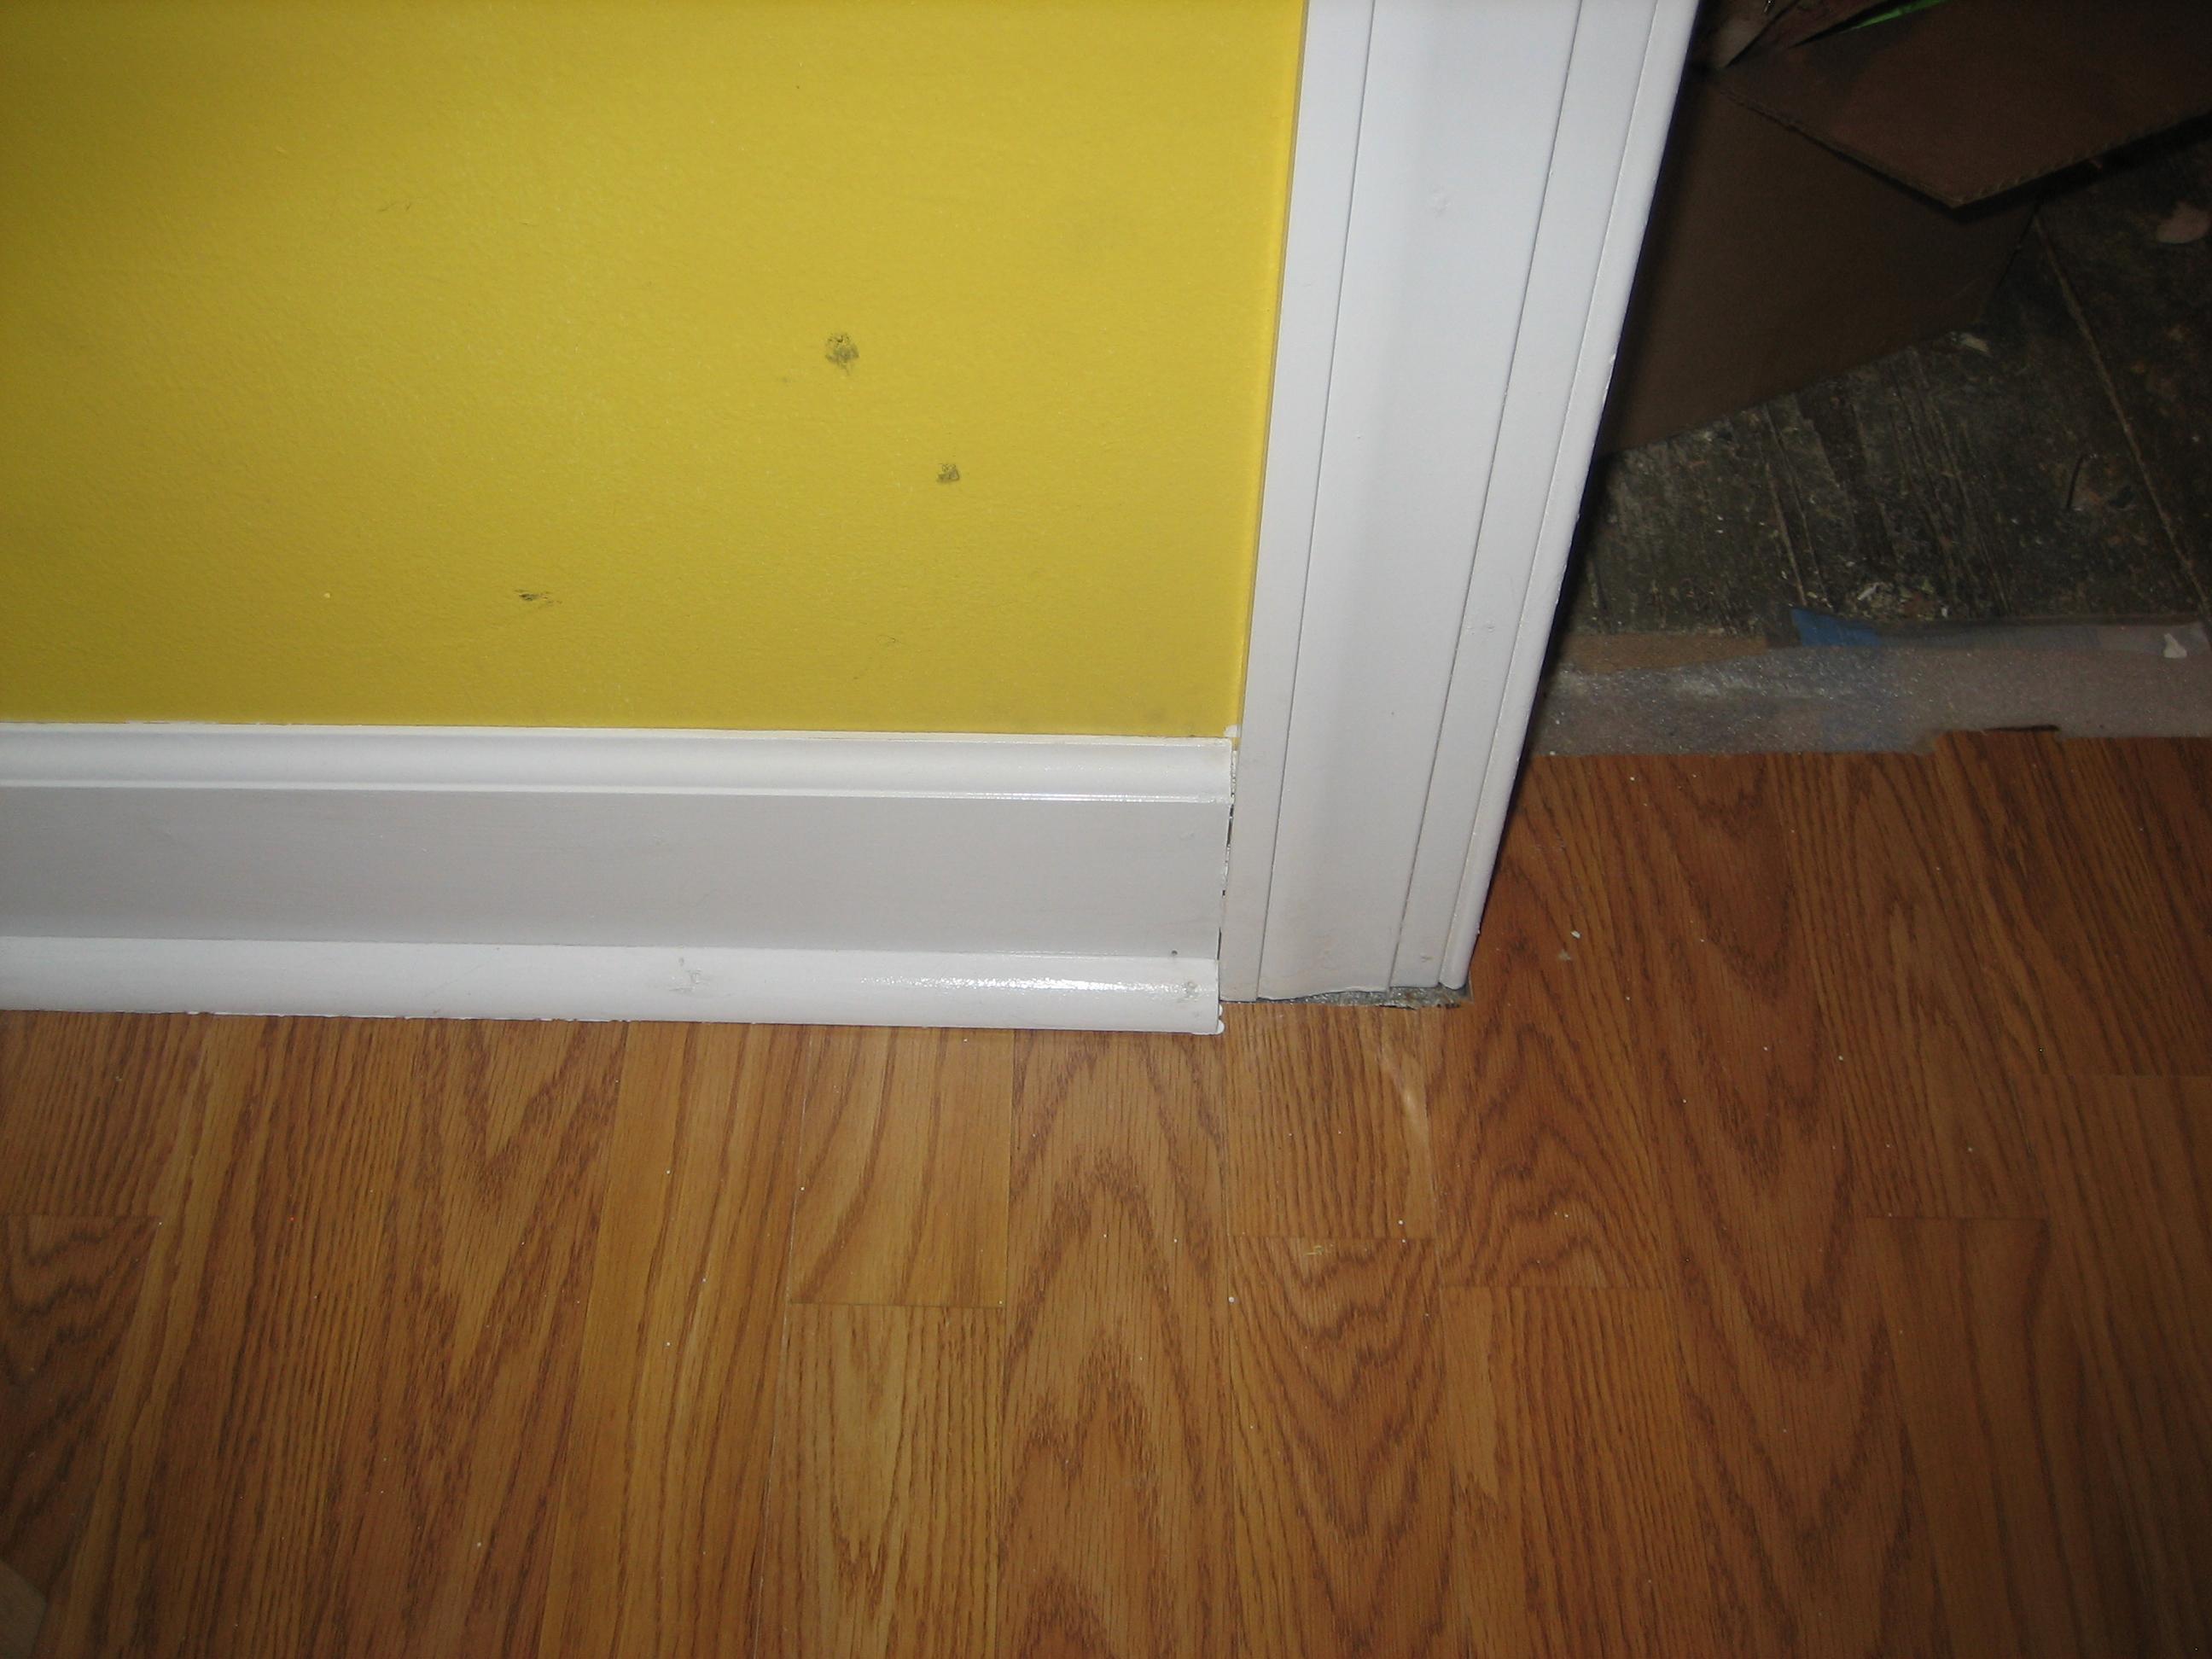 Cherry wood crown molding wallpaper border img 4348 2592x1944